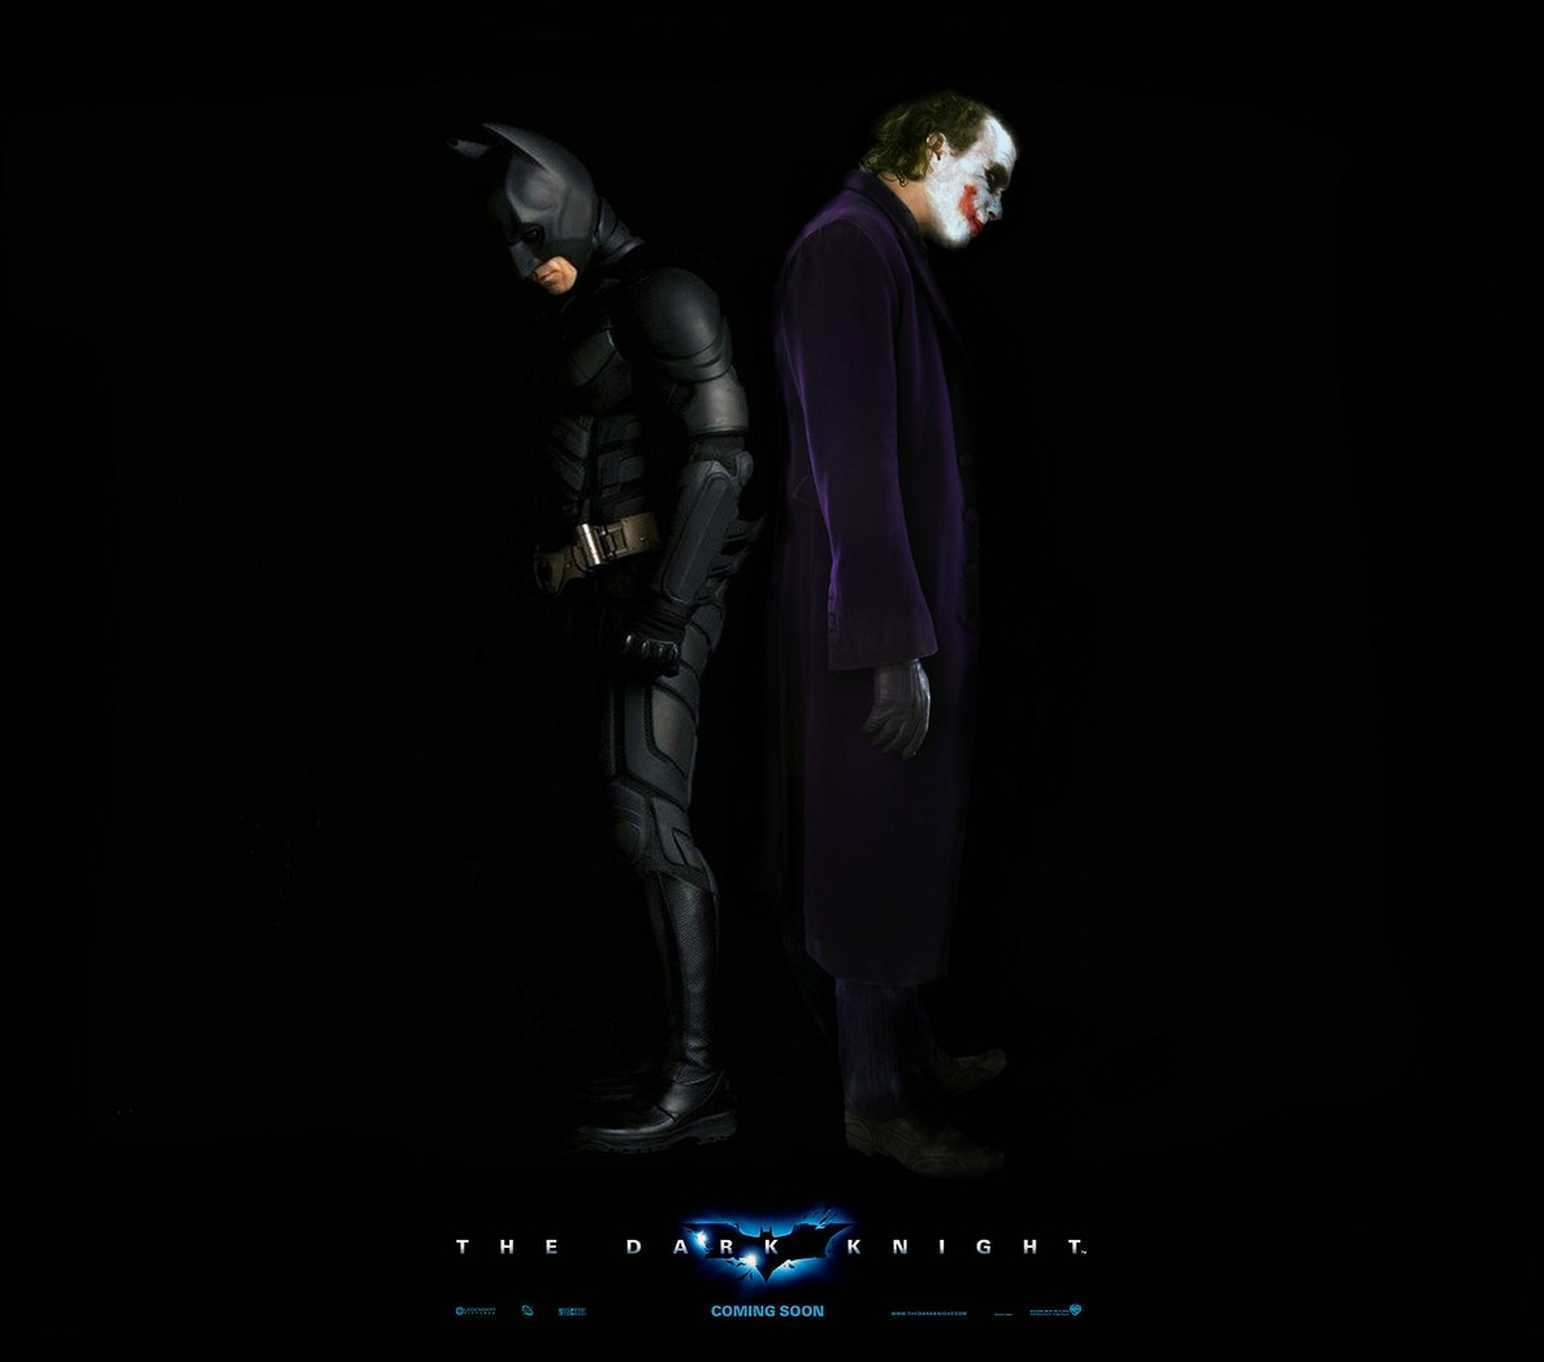 The Dark Knight Images Batman Joker Hd Wallpaper And Background